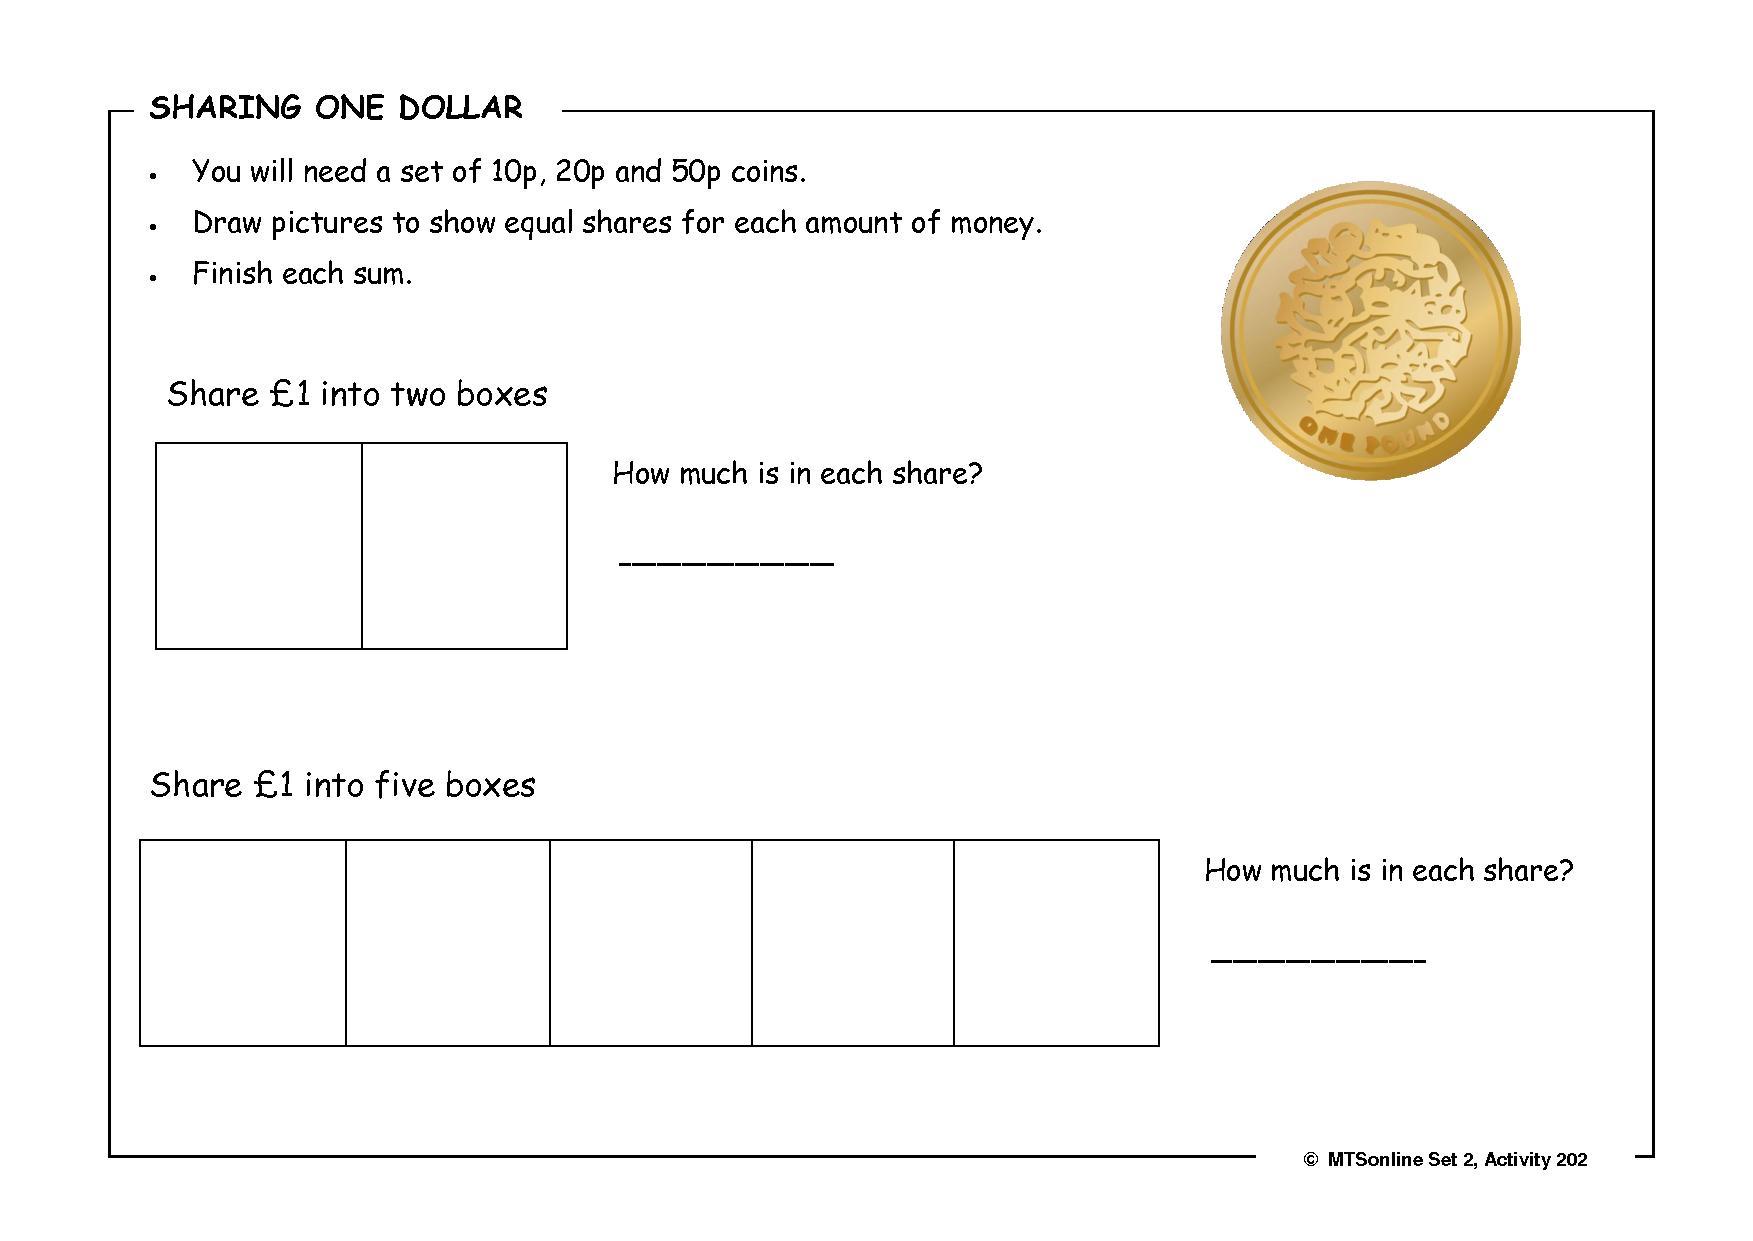 202sharing_one_dollar.gb0001